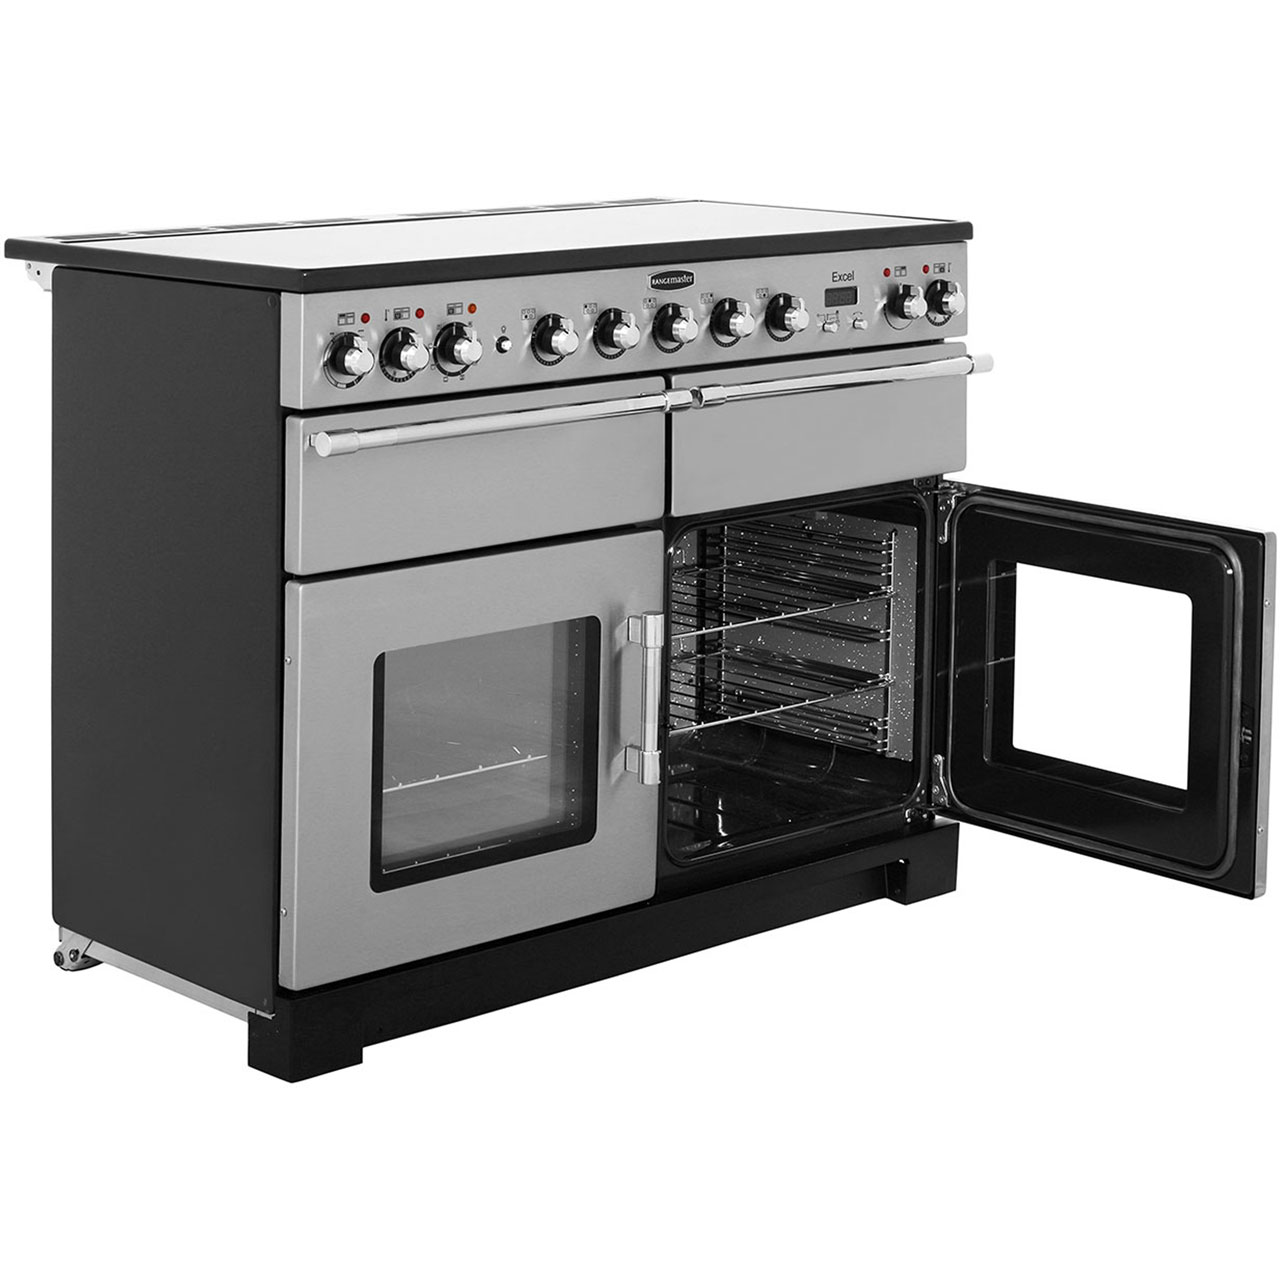 Rangemaster Exl110eisl C Excel 110cm 5 Burners A A Electric Range Cooker Slate